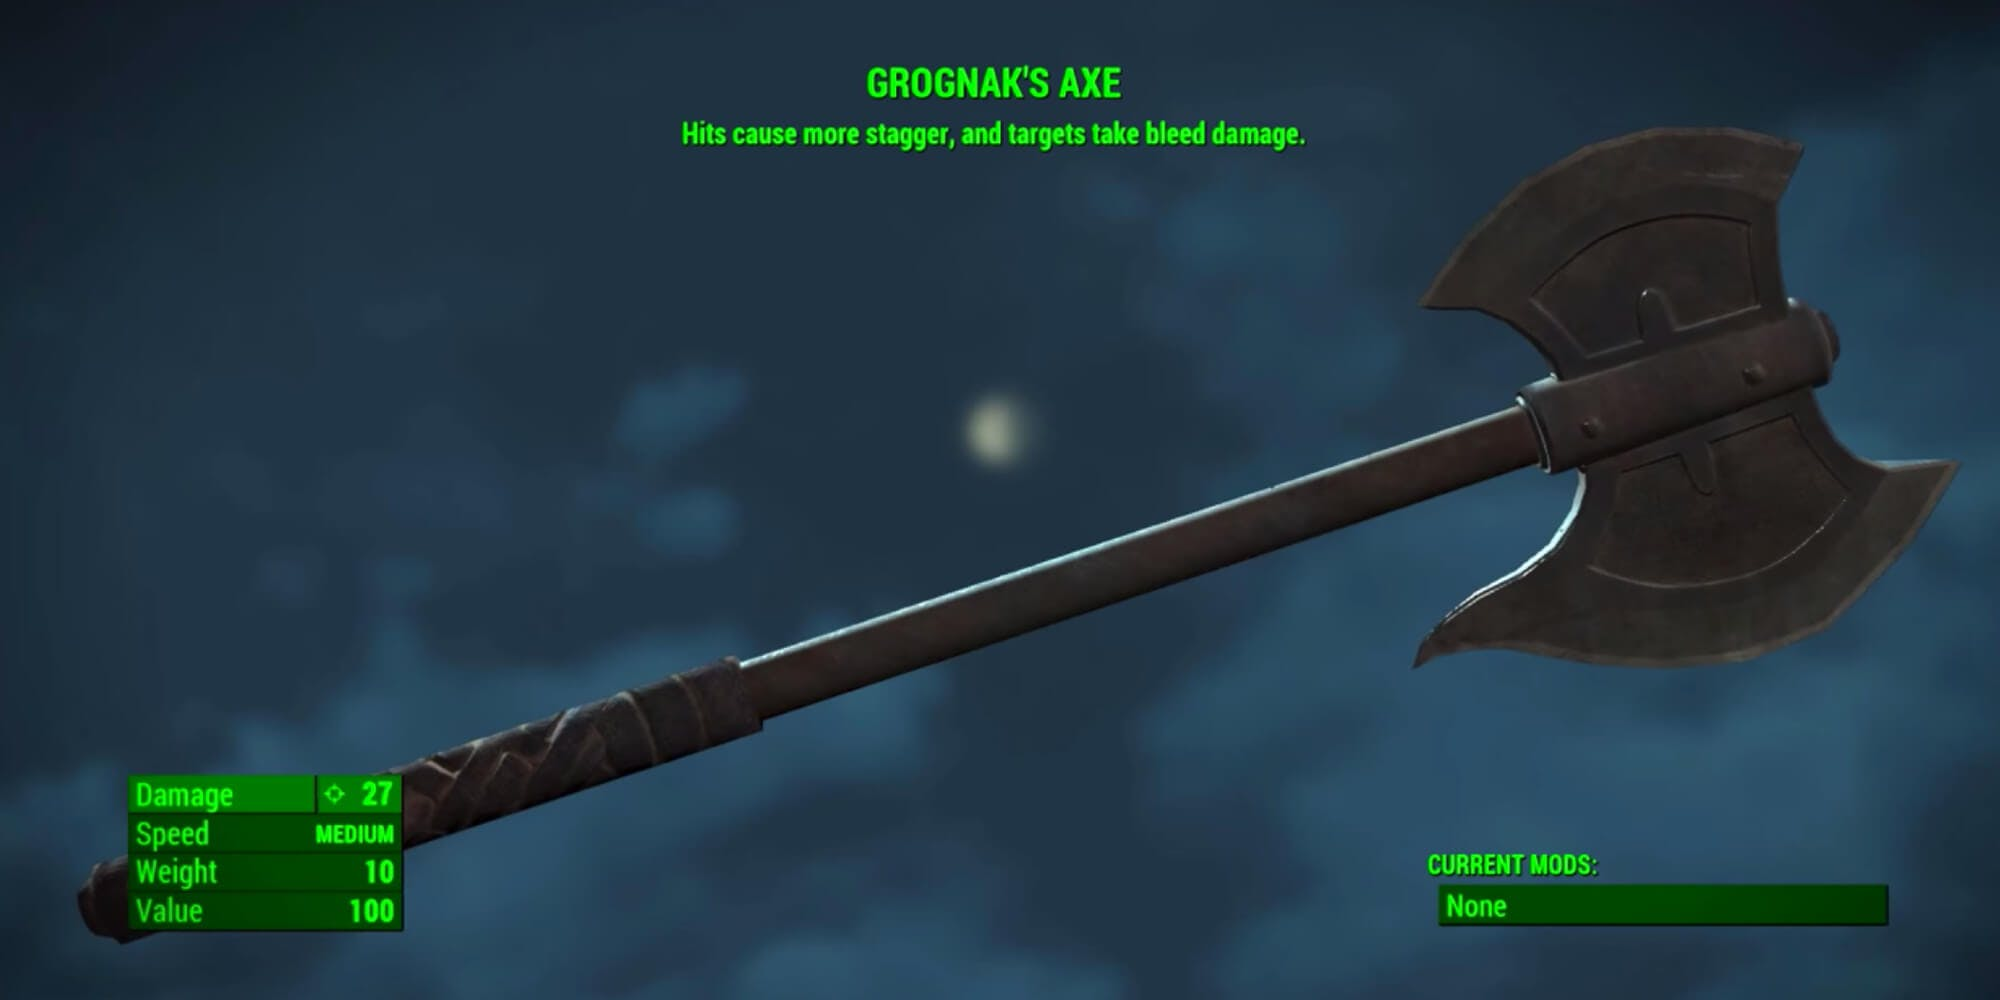 fallout 4 weapons - Grognak's Axe